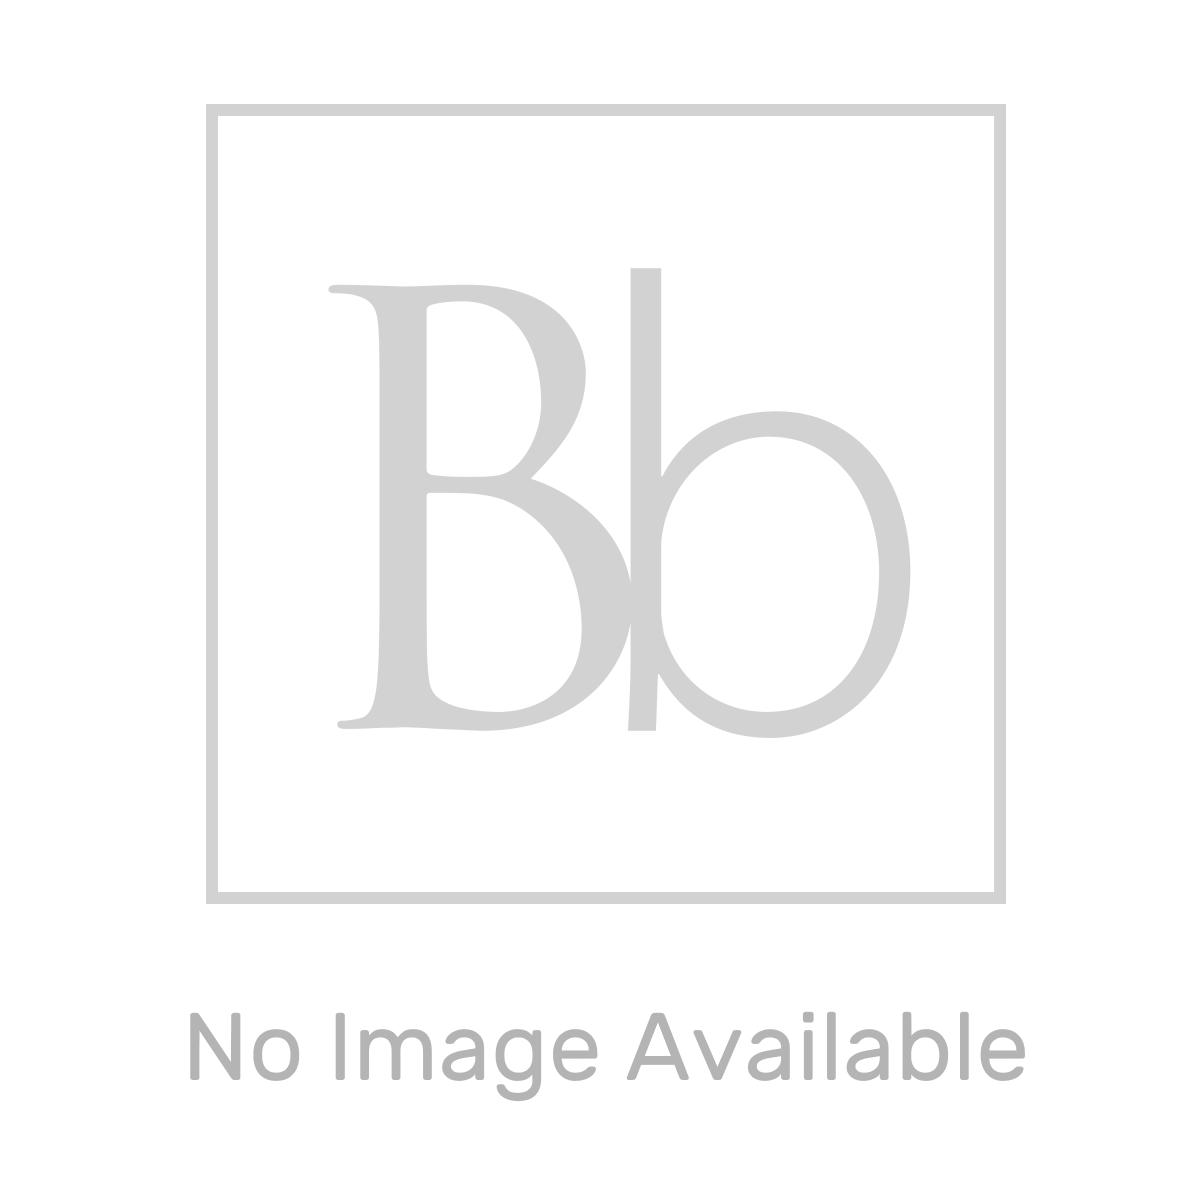 RAK Ecofix Chrome Flush Plate with Rectangular Push Buttons Measurements